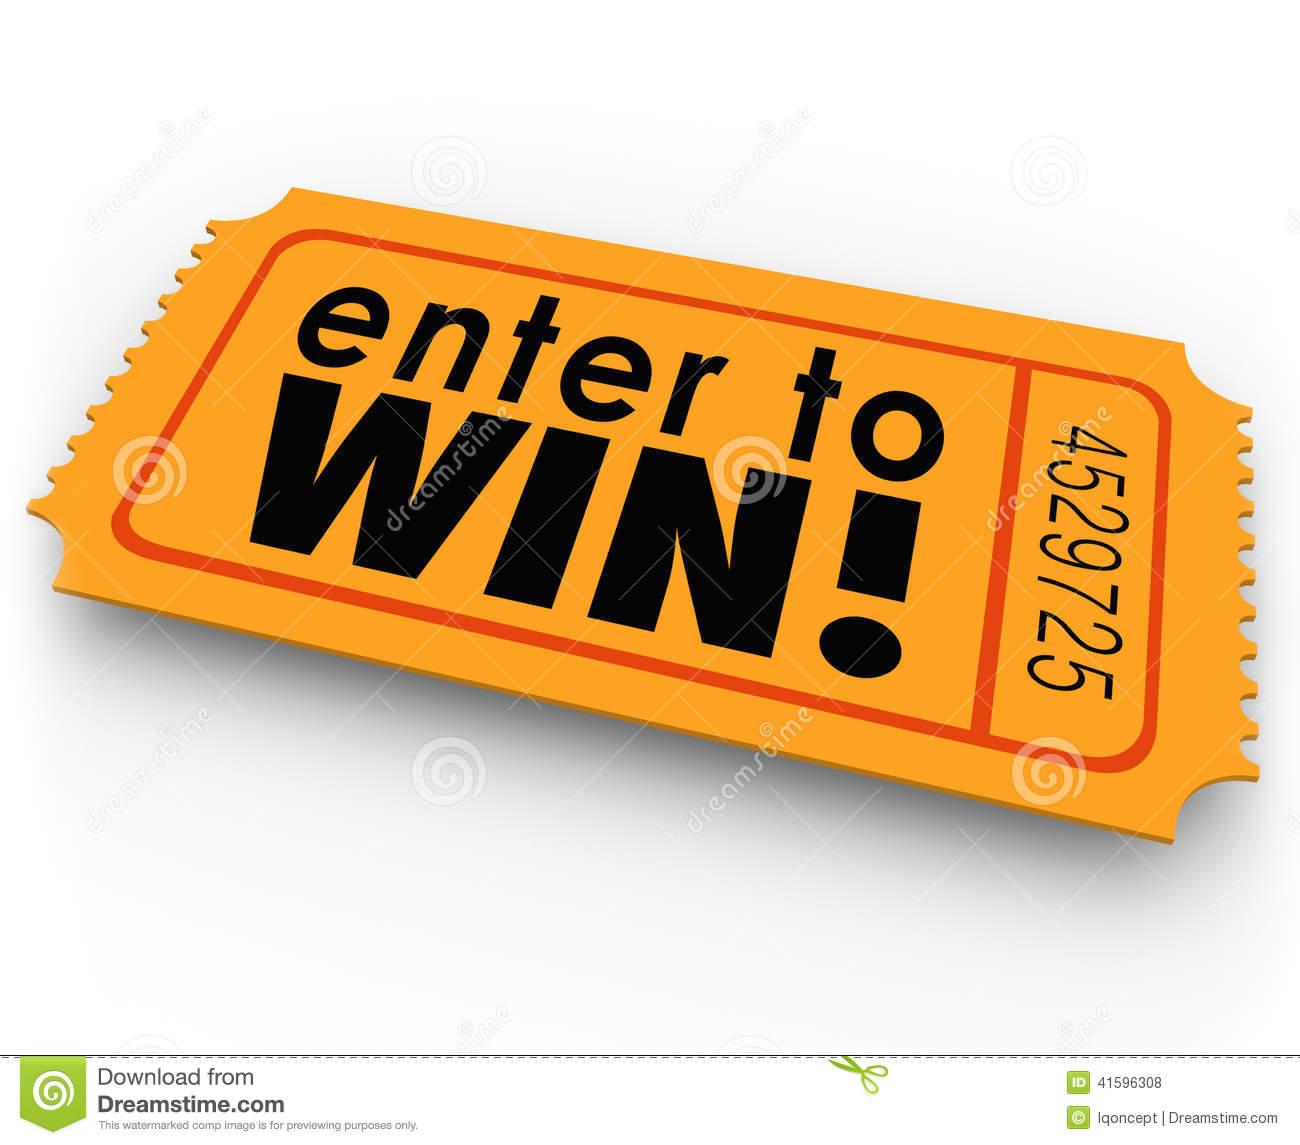 50 50 raffle clipart clip library Raffle Tickets Clipart & Raffle Tickets Clip Art Images ... clip library